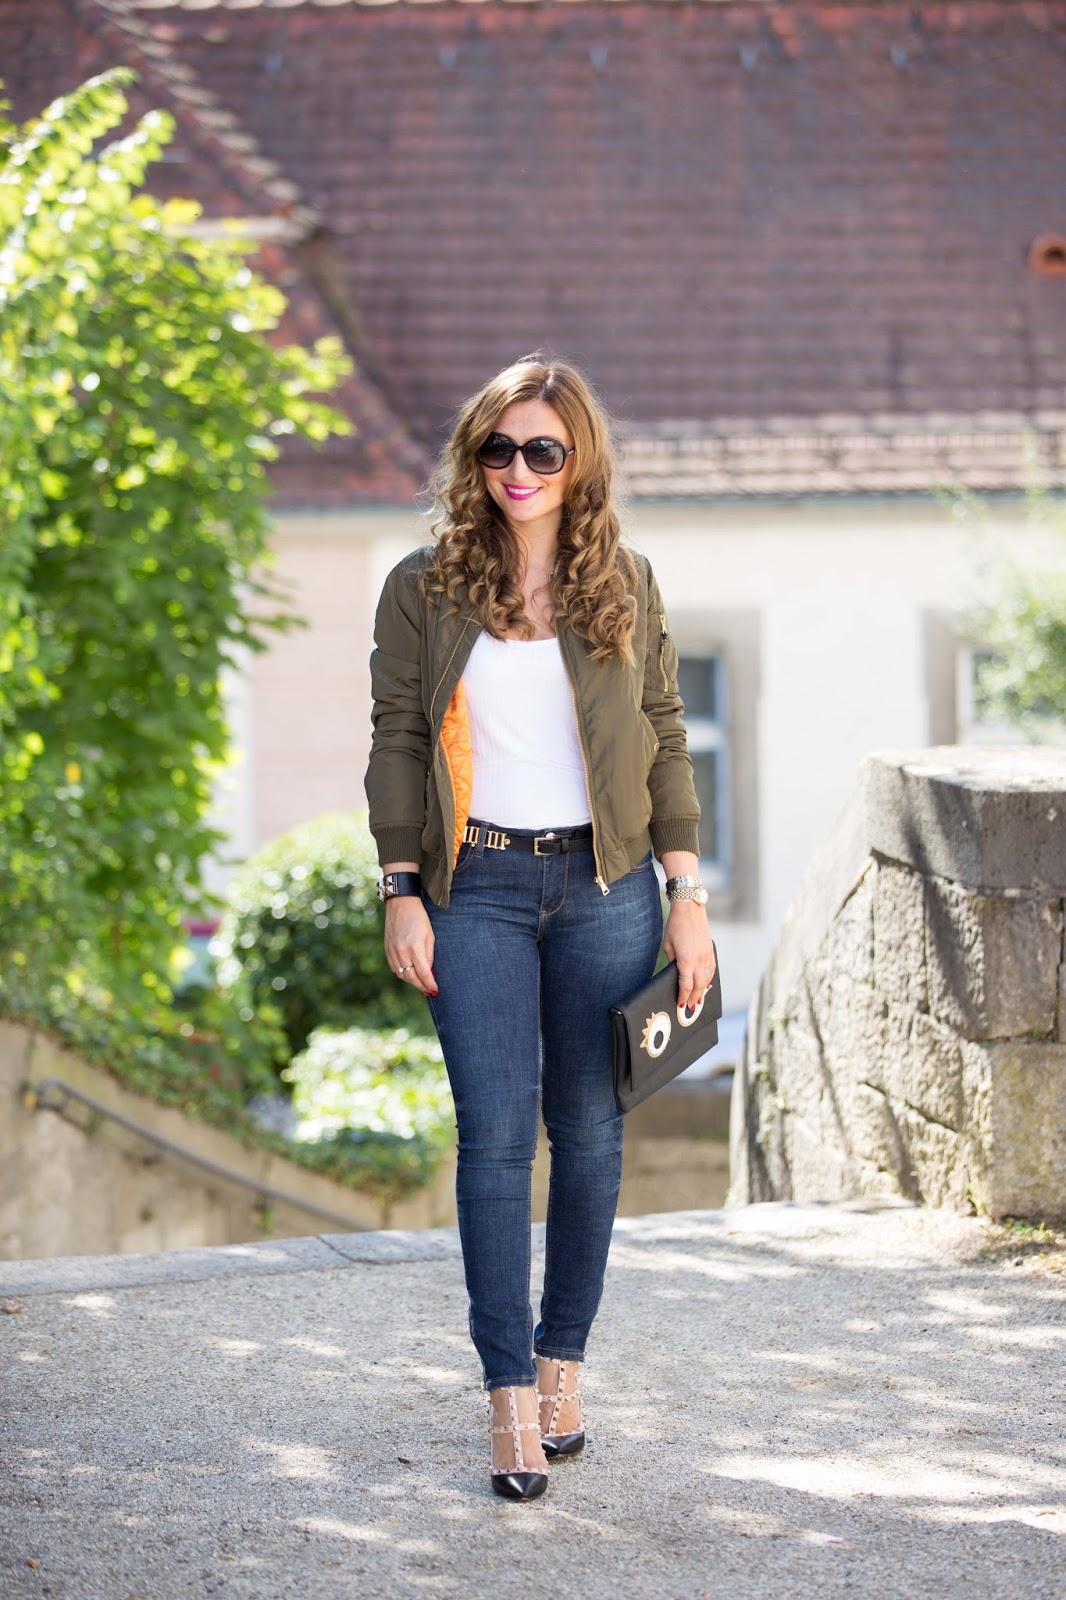 Streetstyleblogger - fashionstylebyjohanna - valentino rockstud lookalike